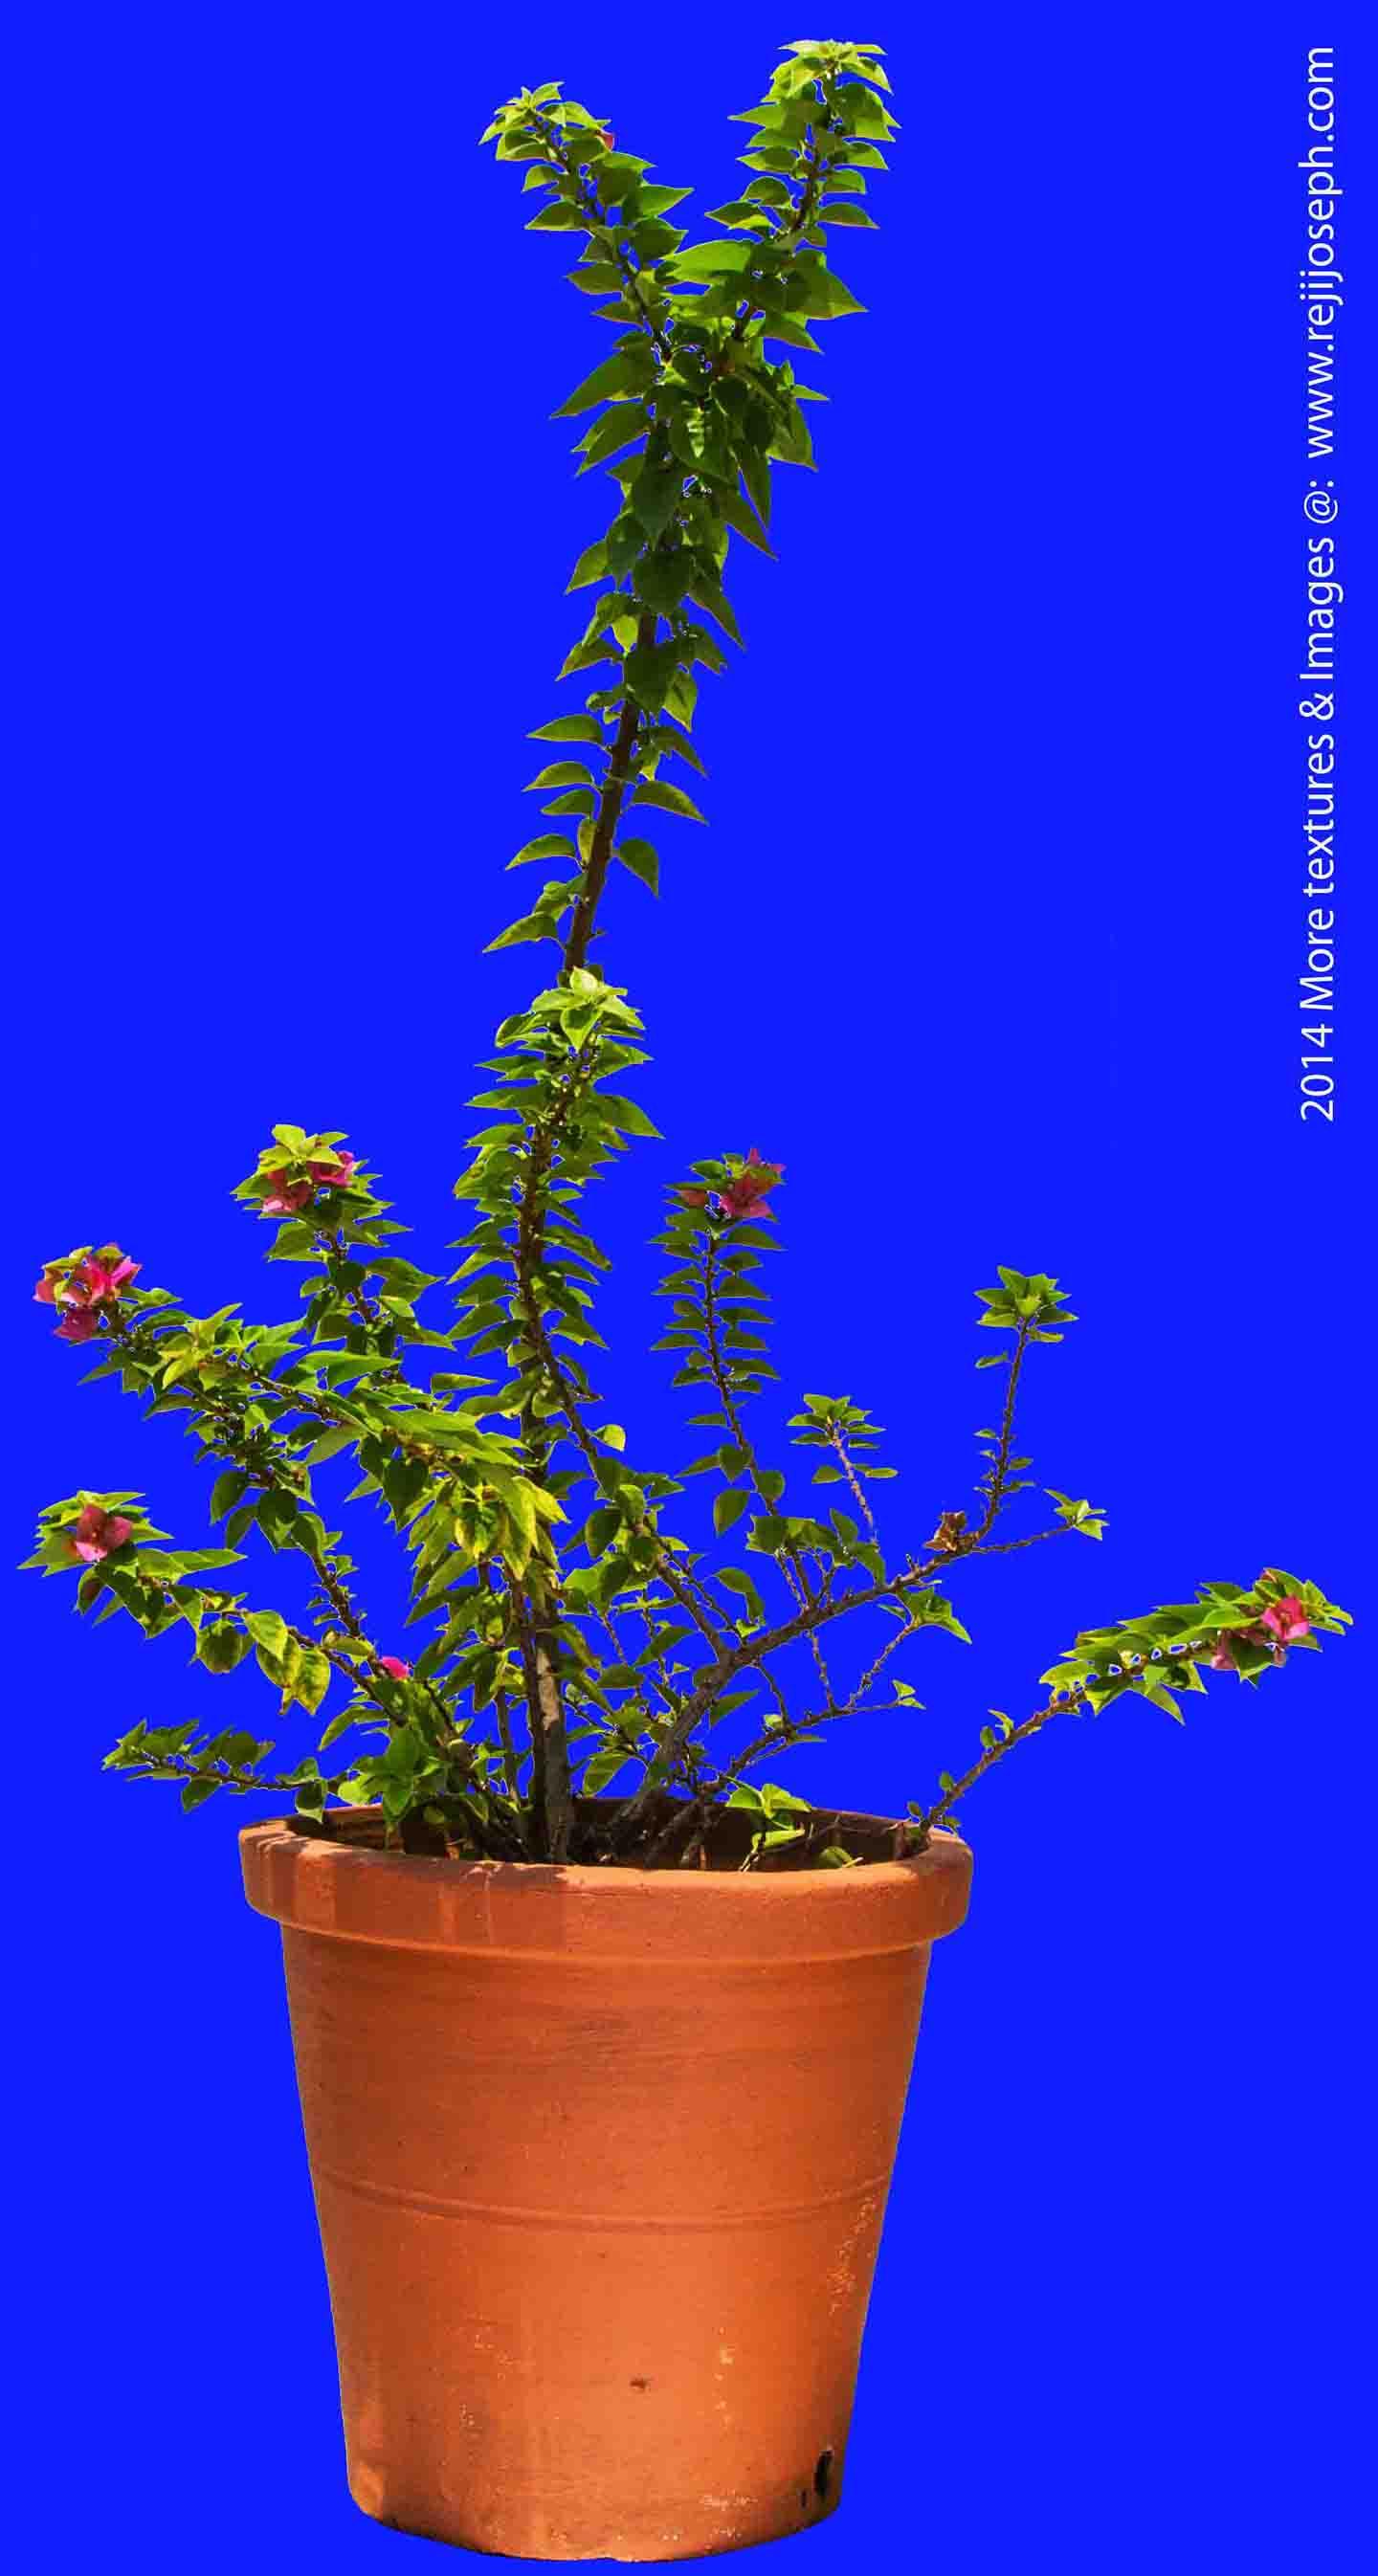 Bougainvillea Garden Plant Texture 00002